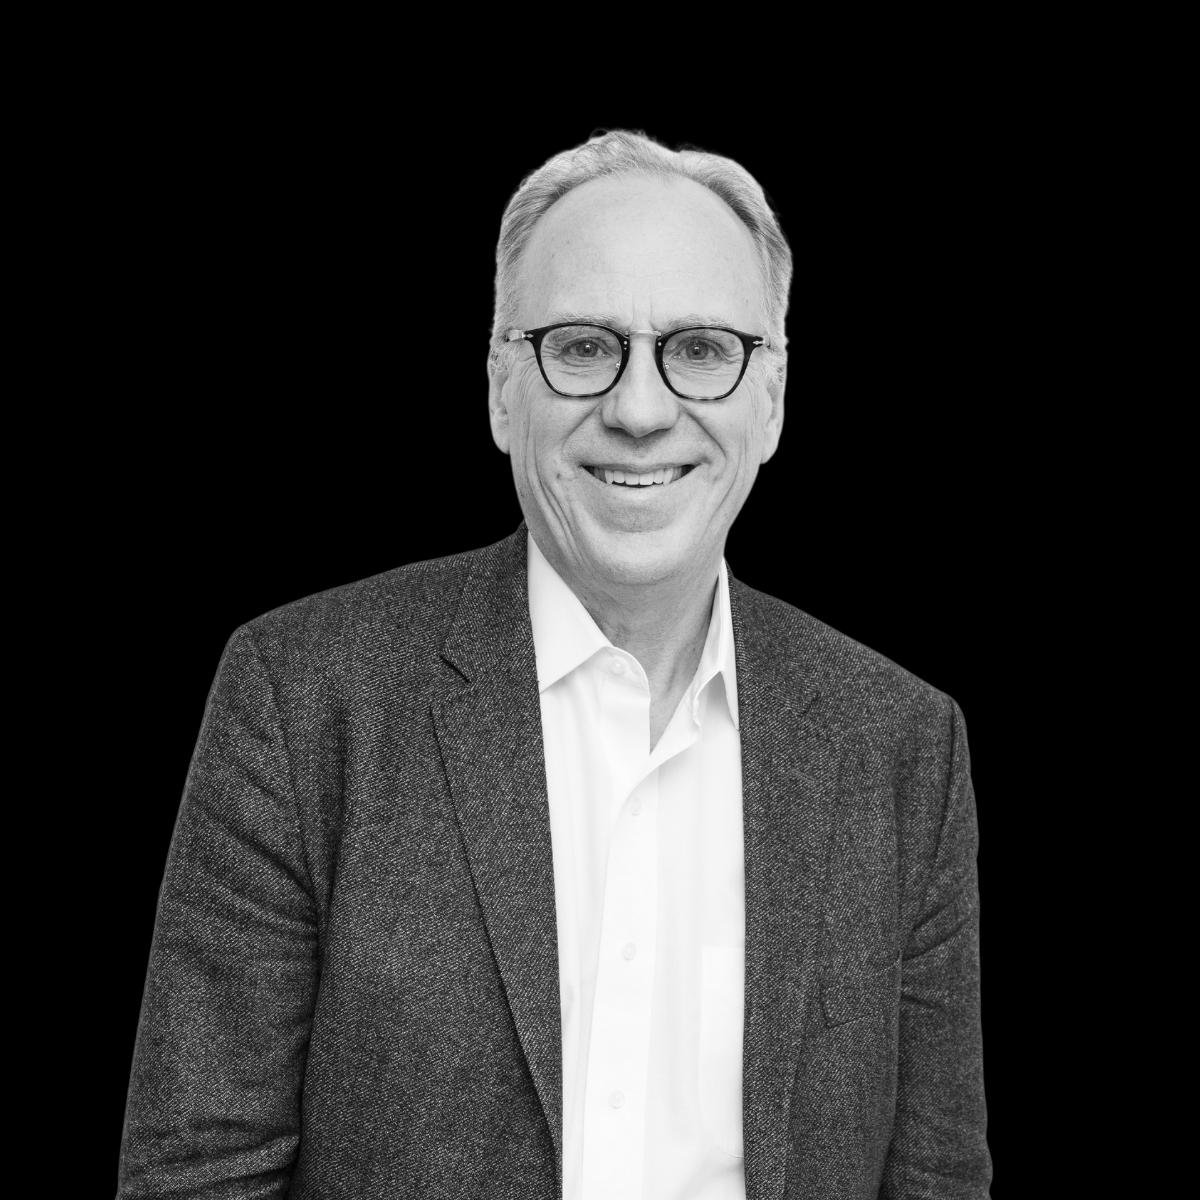 Tomas Hagenfeldt